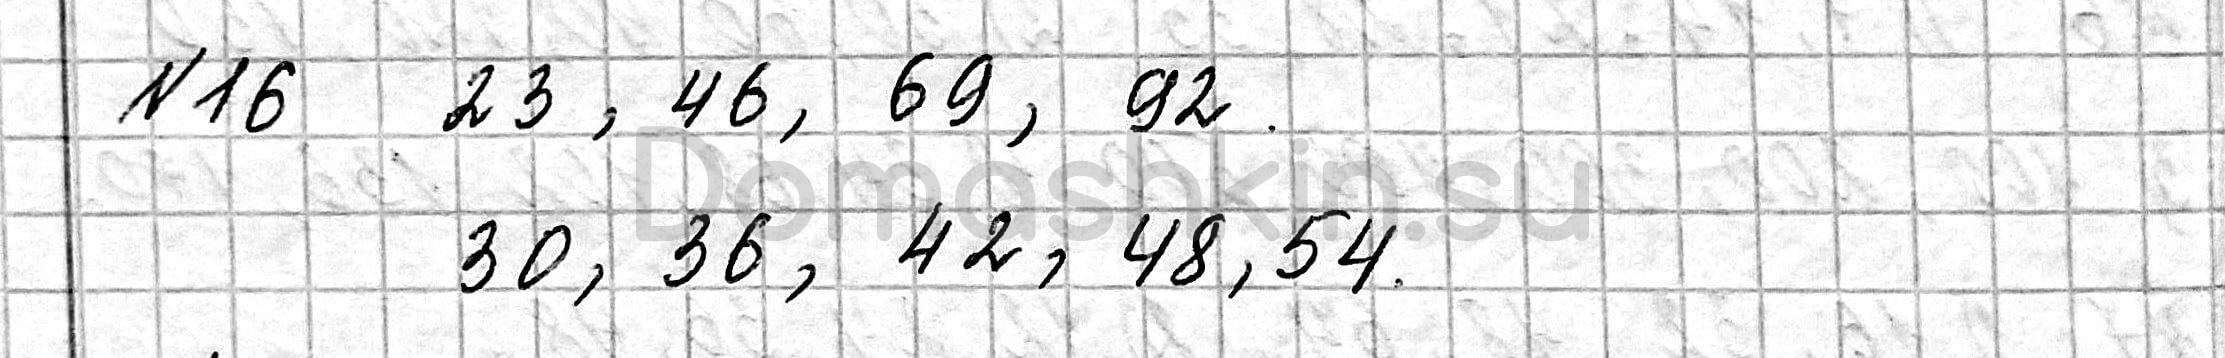 Математика 6 класс учебник Мерзляк номер 16 решение